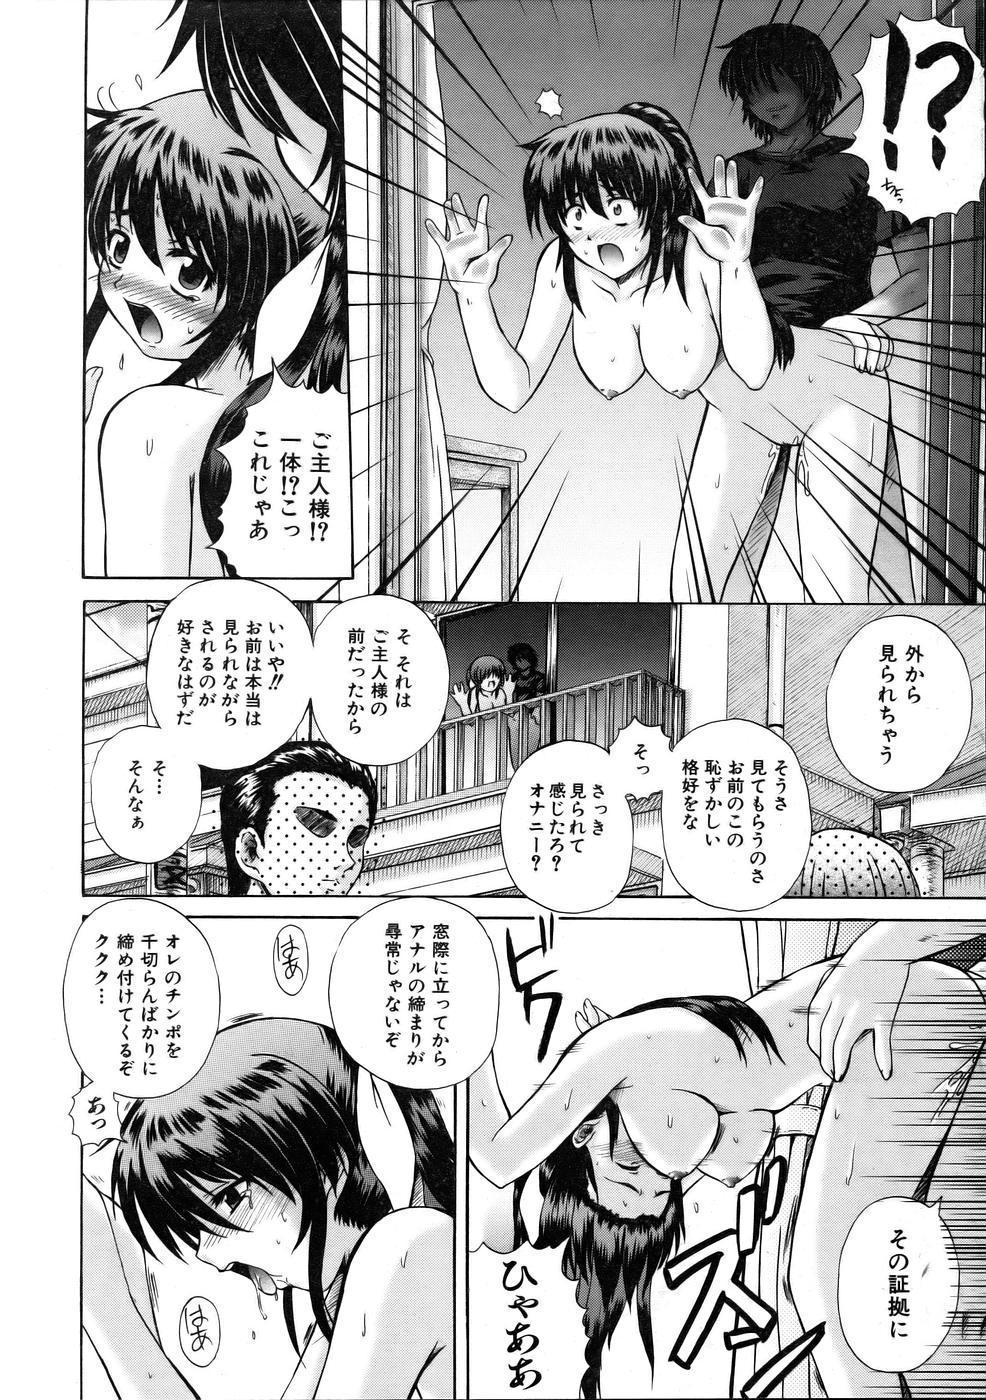 COMIC AUN 2005-10 Vol. 113 177